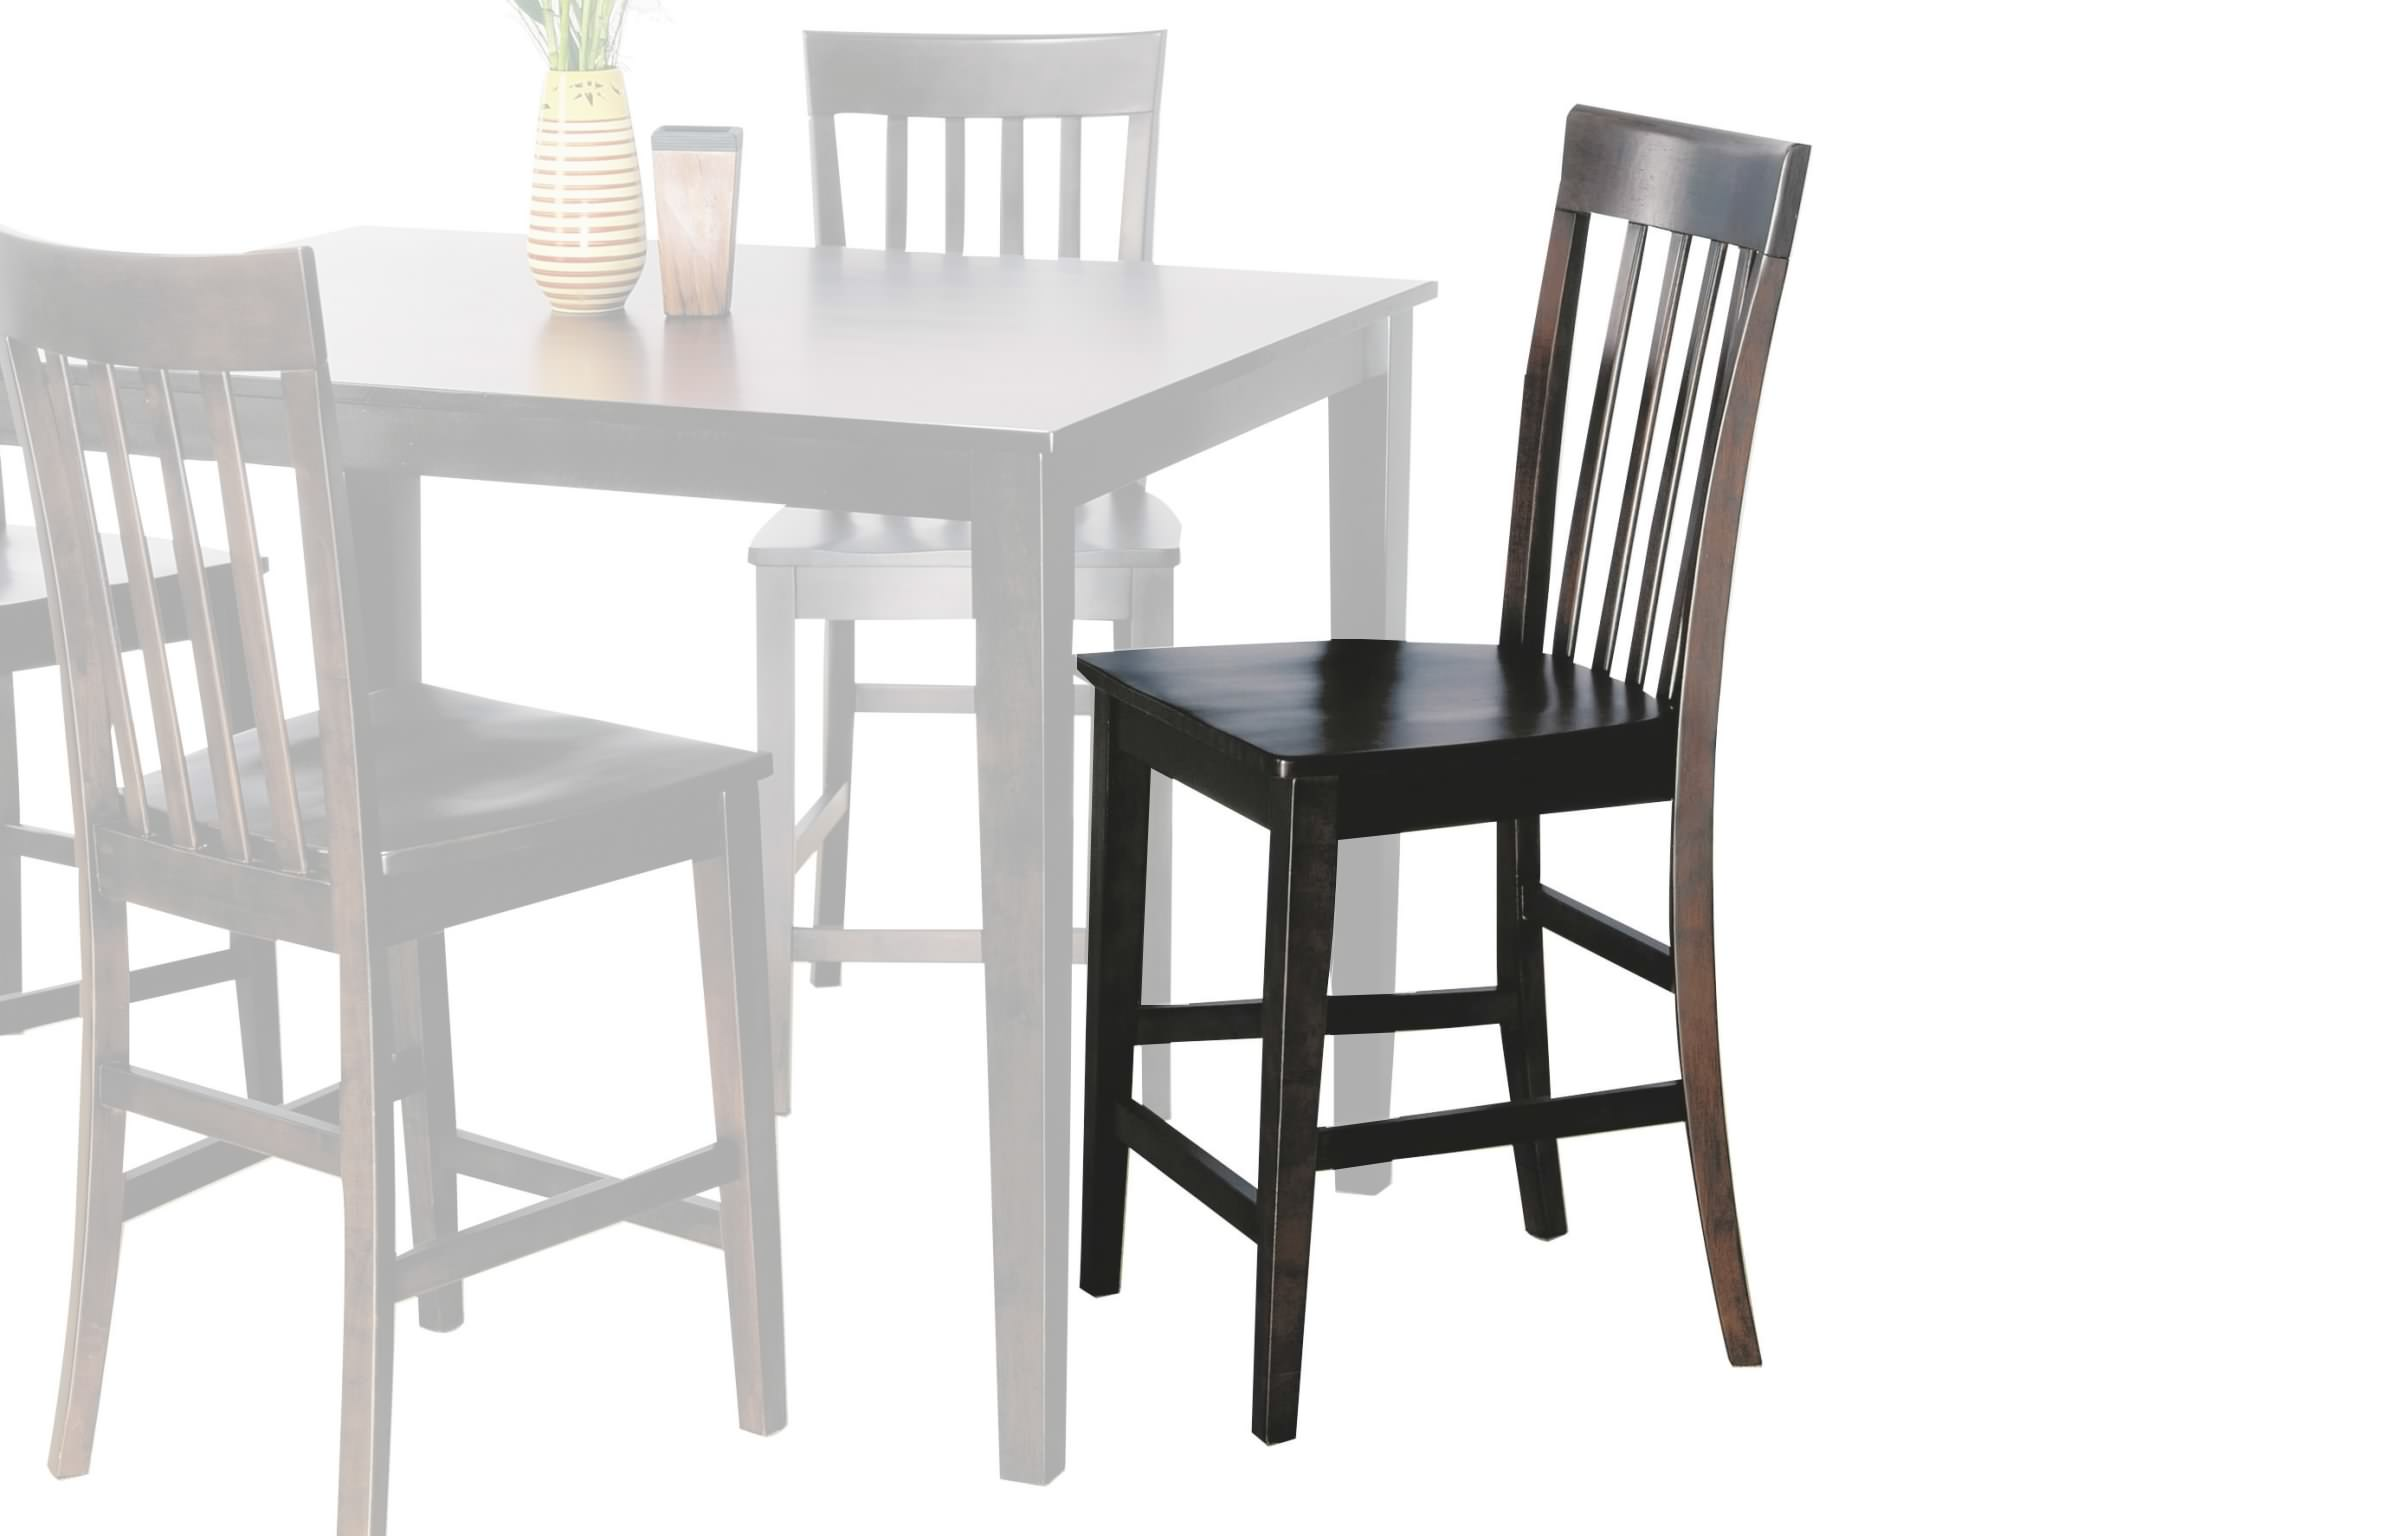 Laketown Furnishings - Chairs